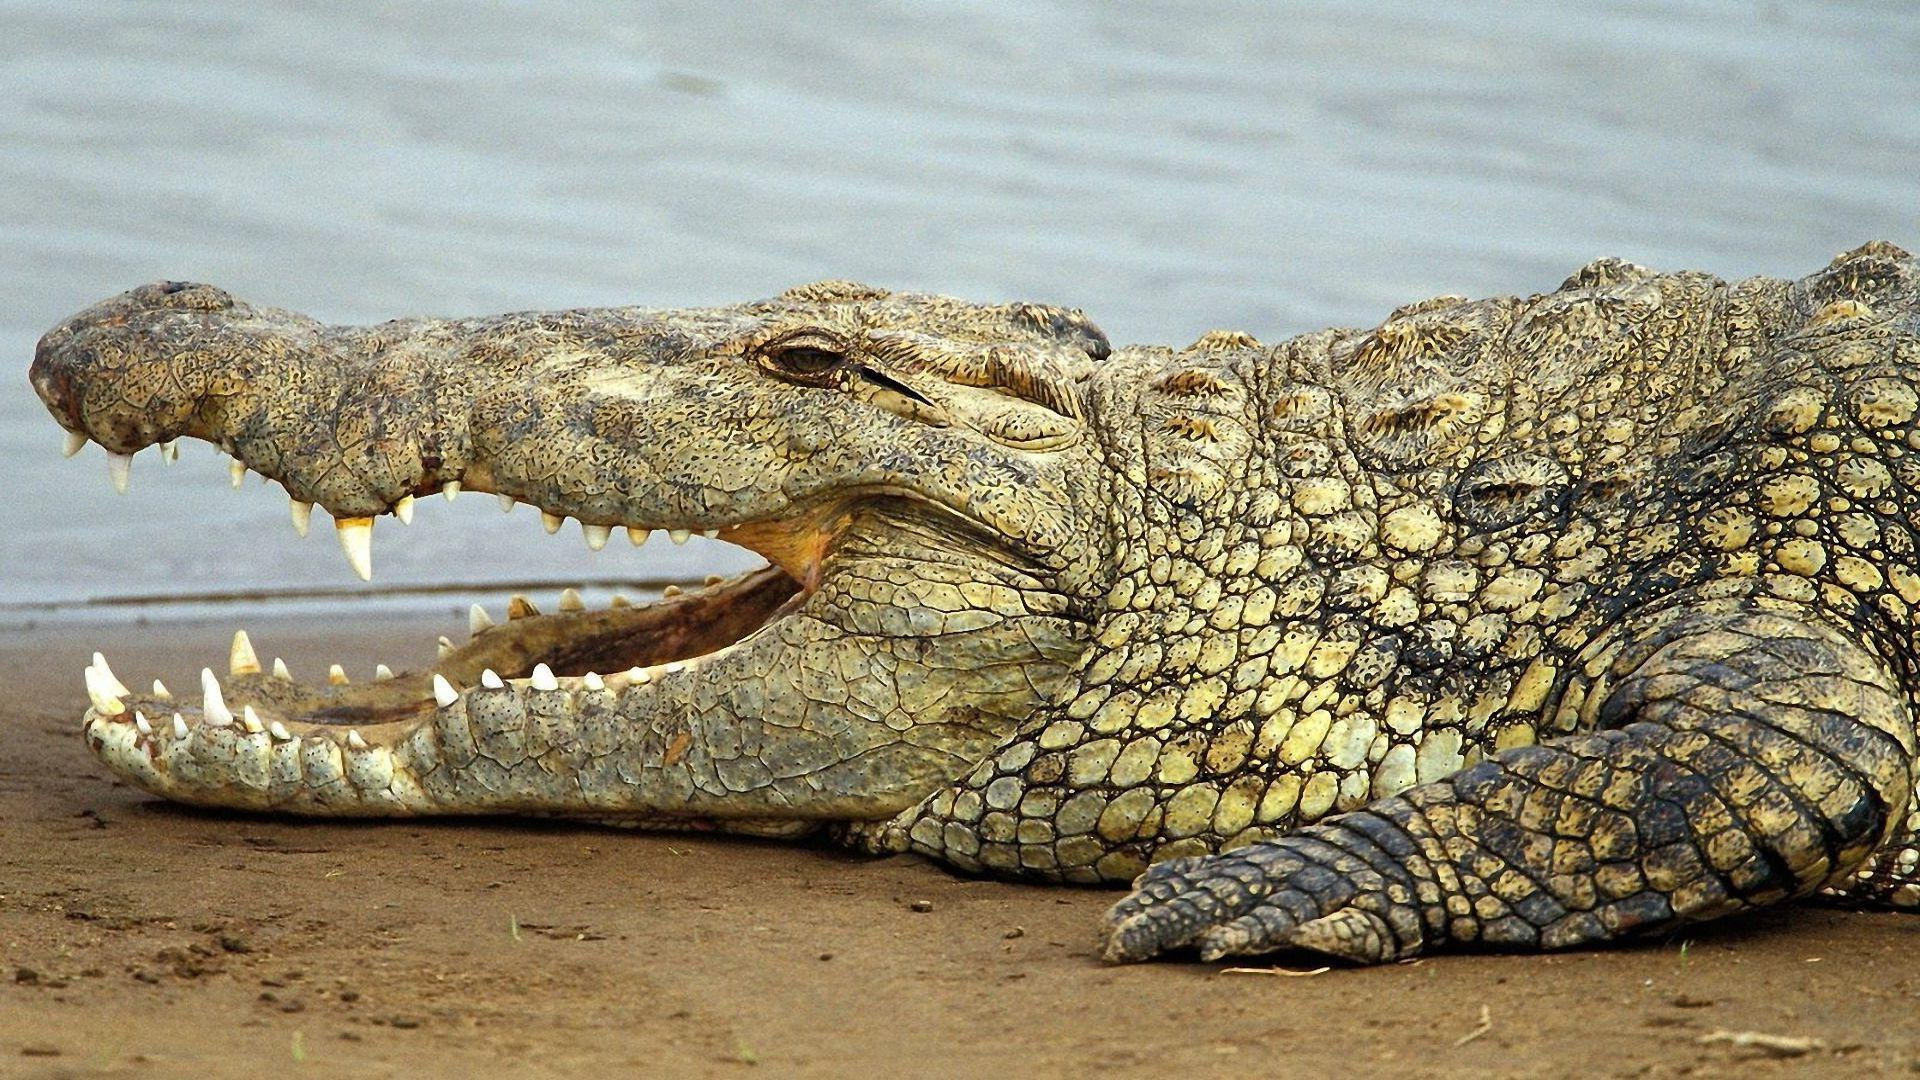 crocodiles and alligators pictures